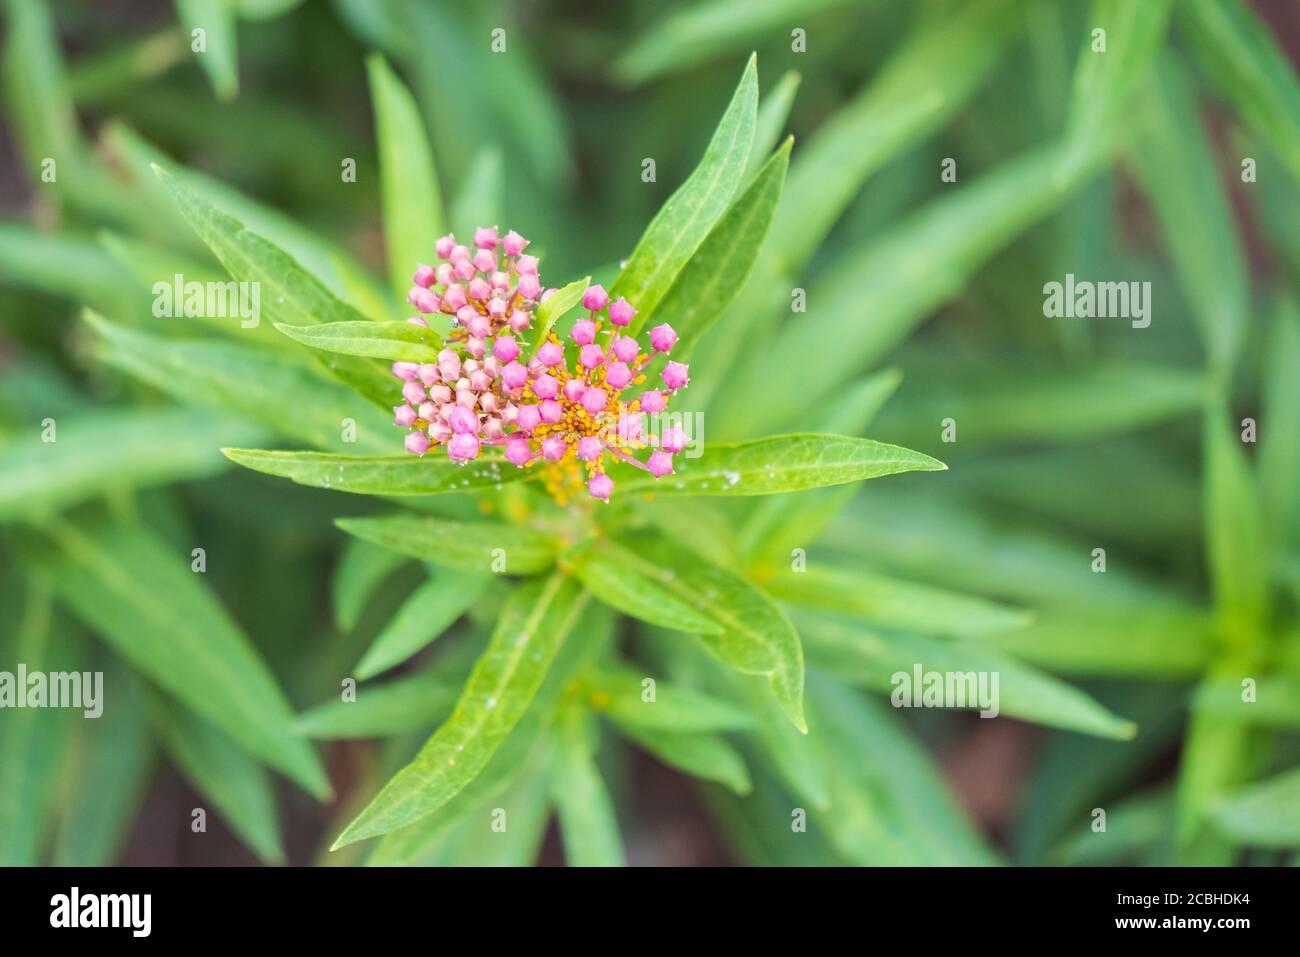 milkweed-or-butterfly-weed-cinderella-a-